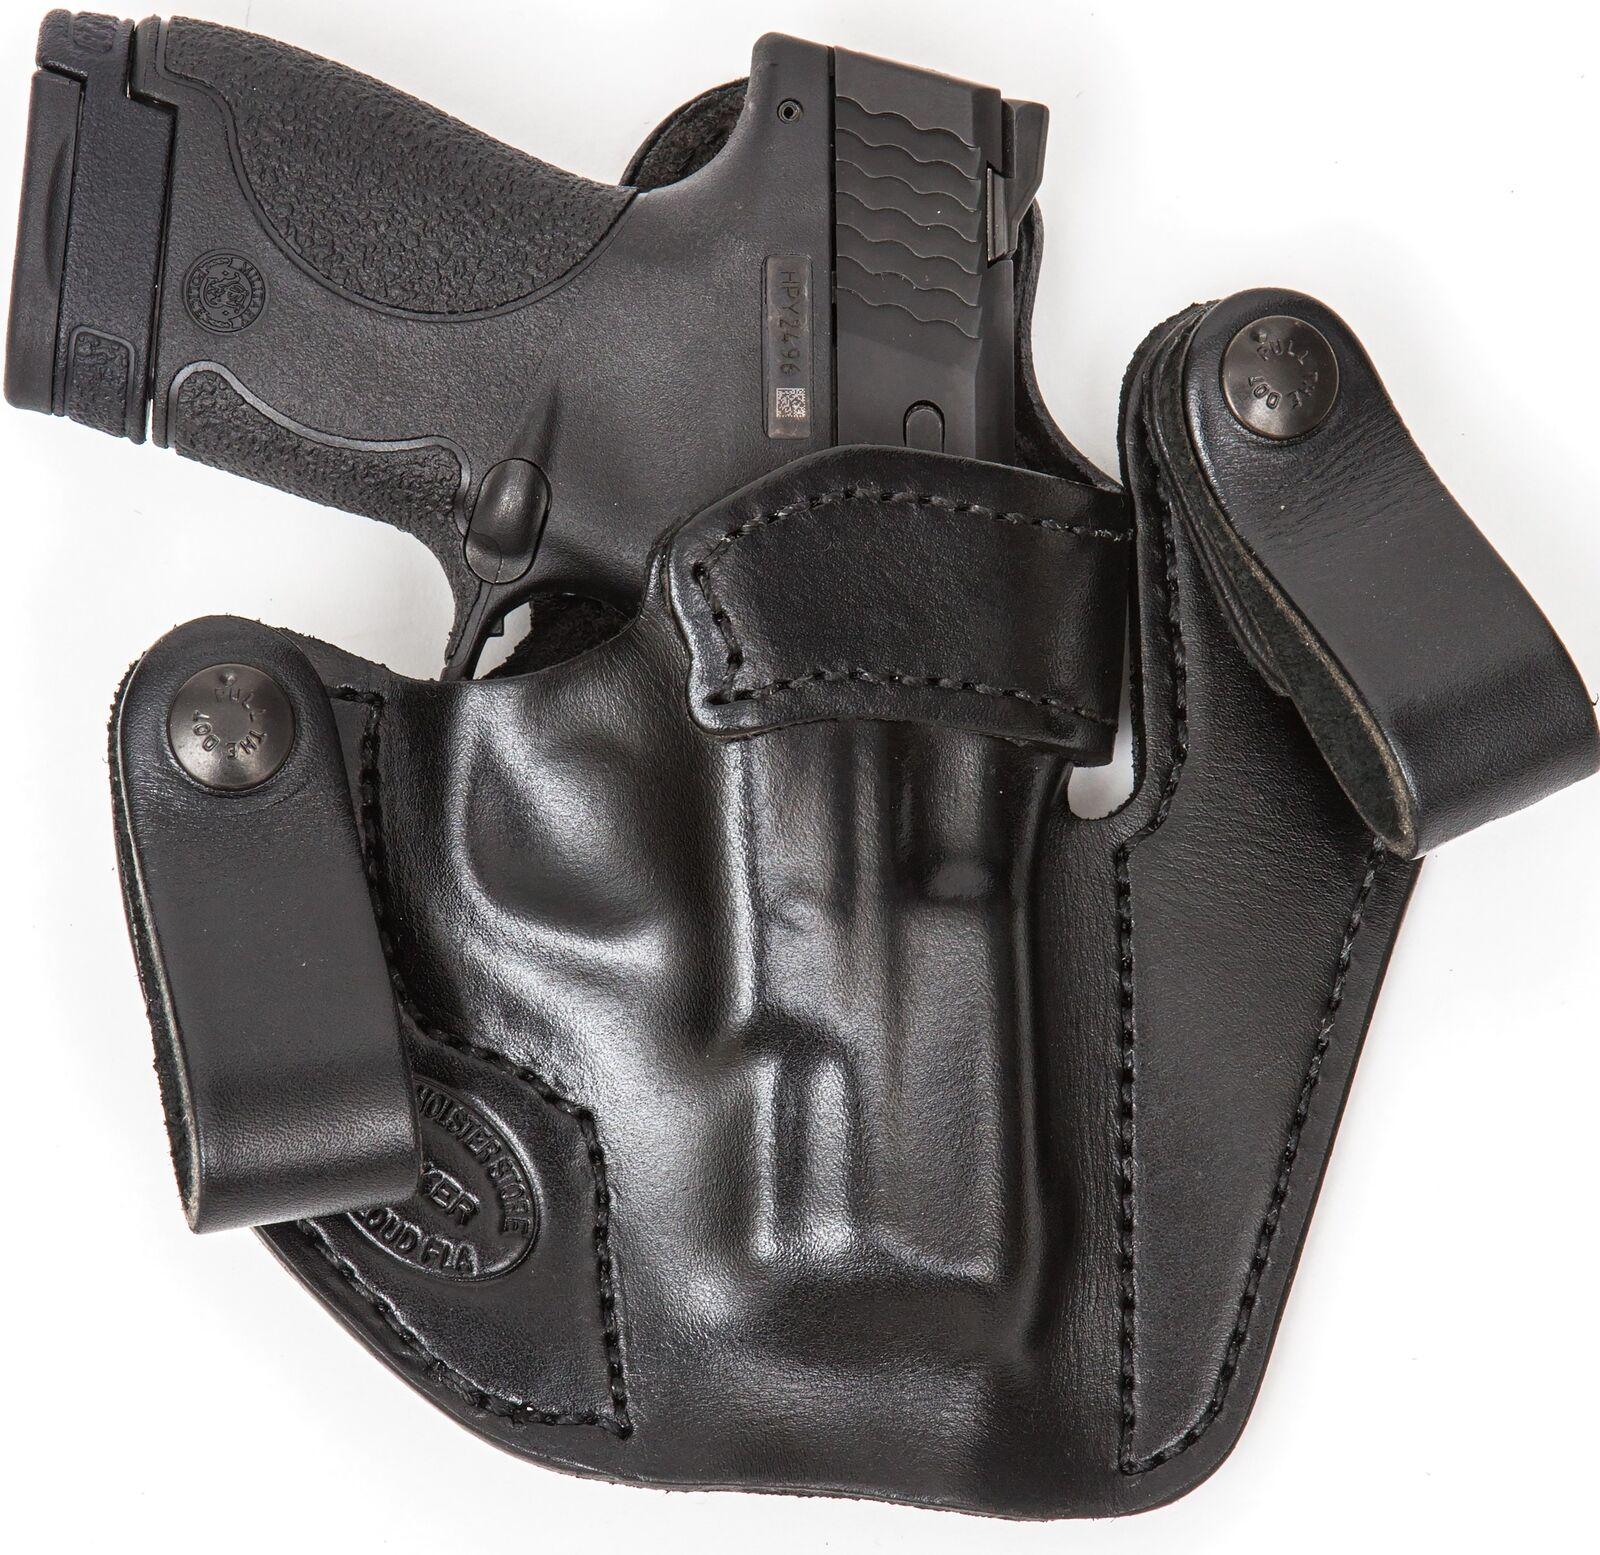 Xtreme llevar RH LH IWB Cuero Funda Pistola para ciudadela 1911 3.5